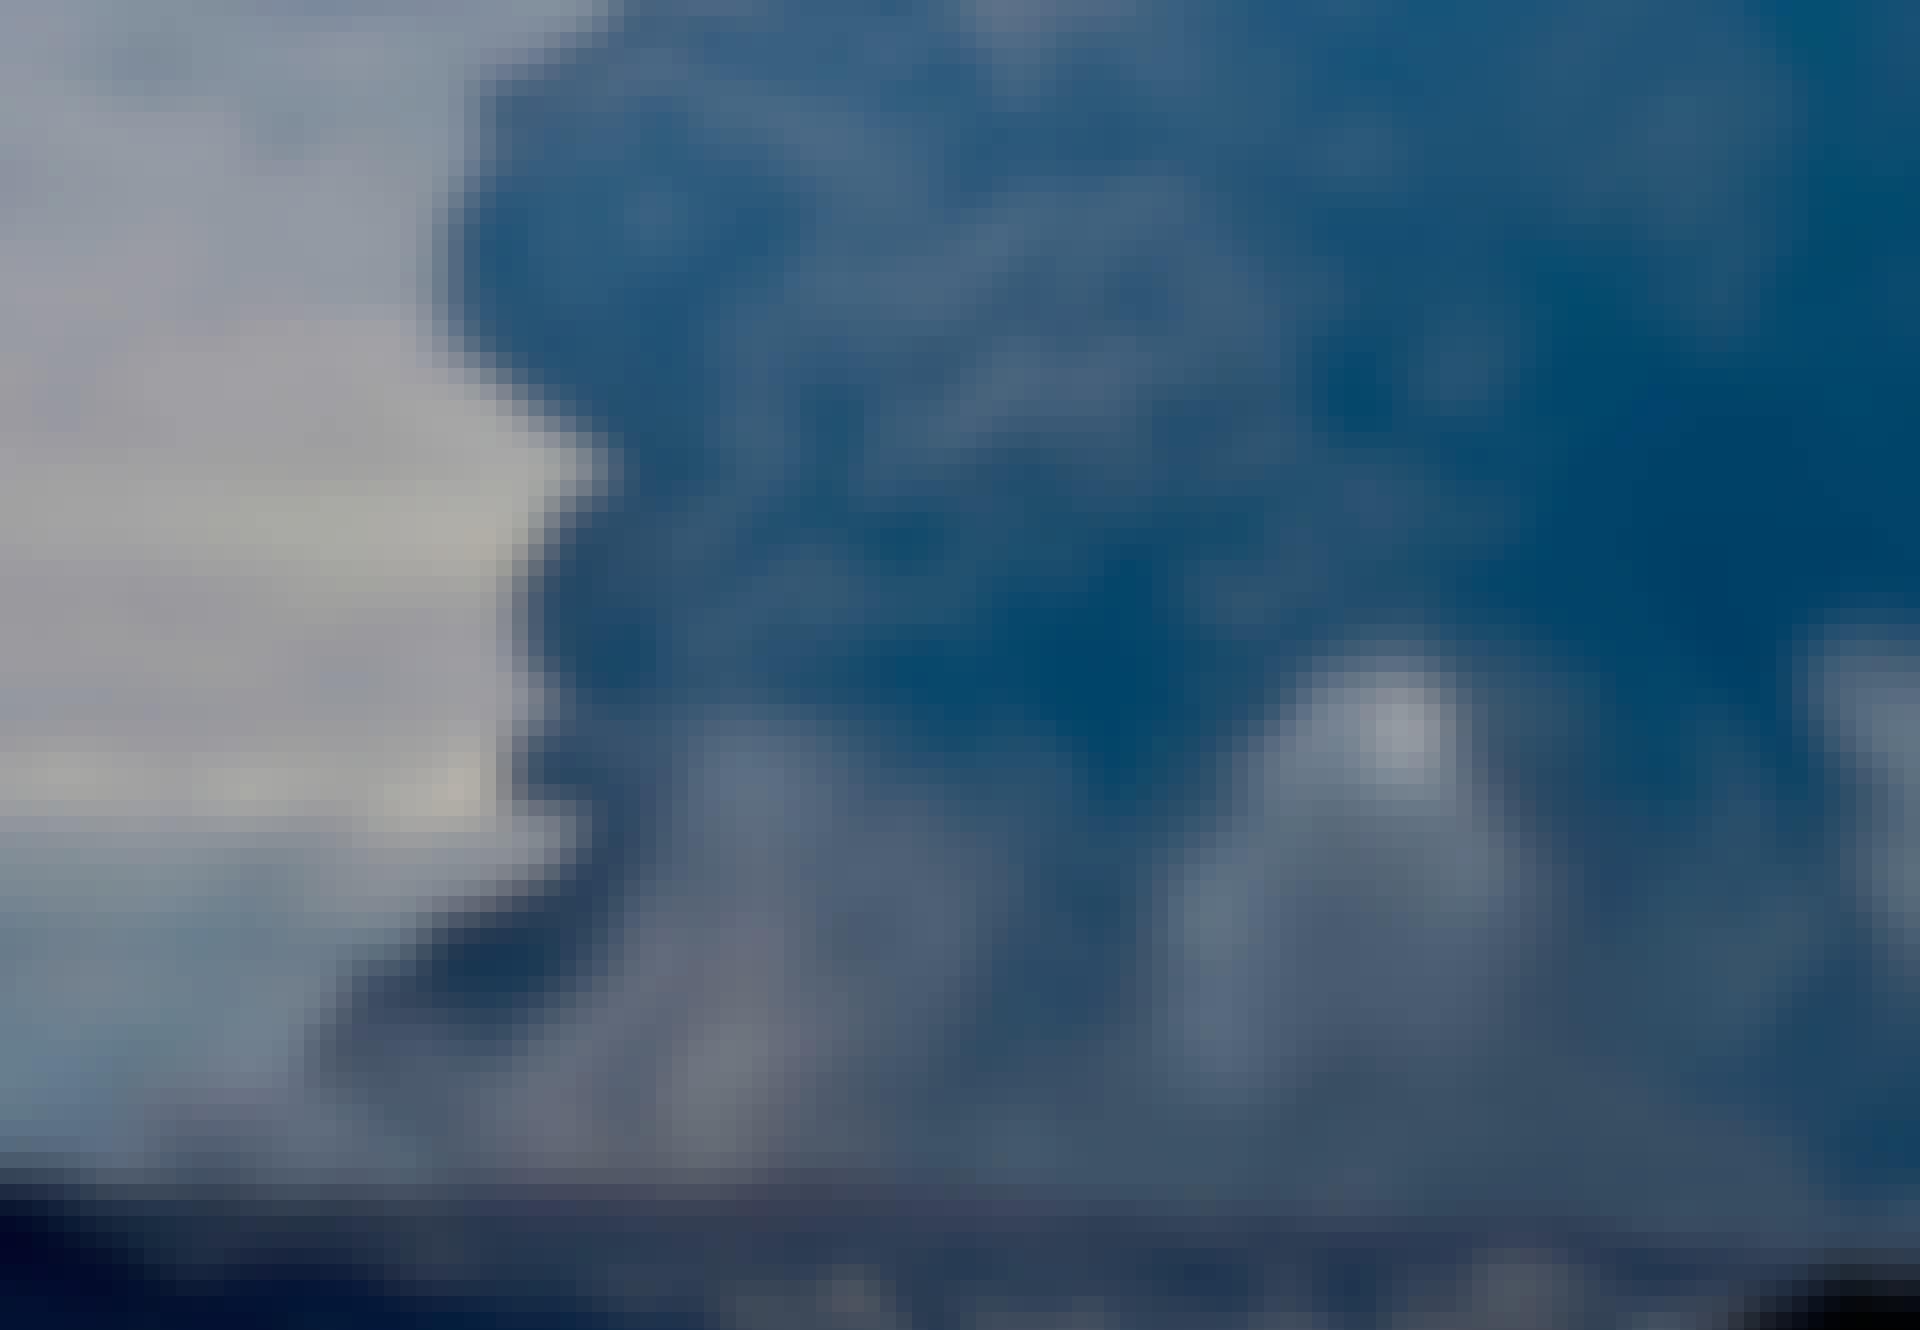 Supervulkanen – supervulkaan in uitbarsting